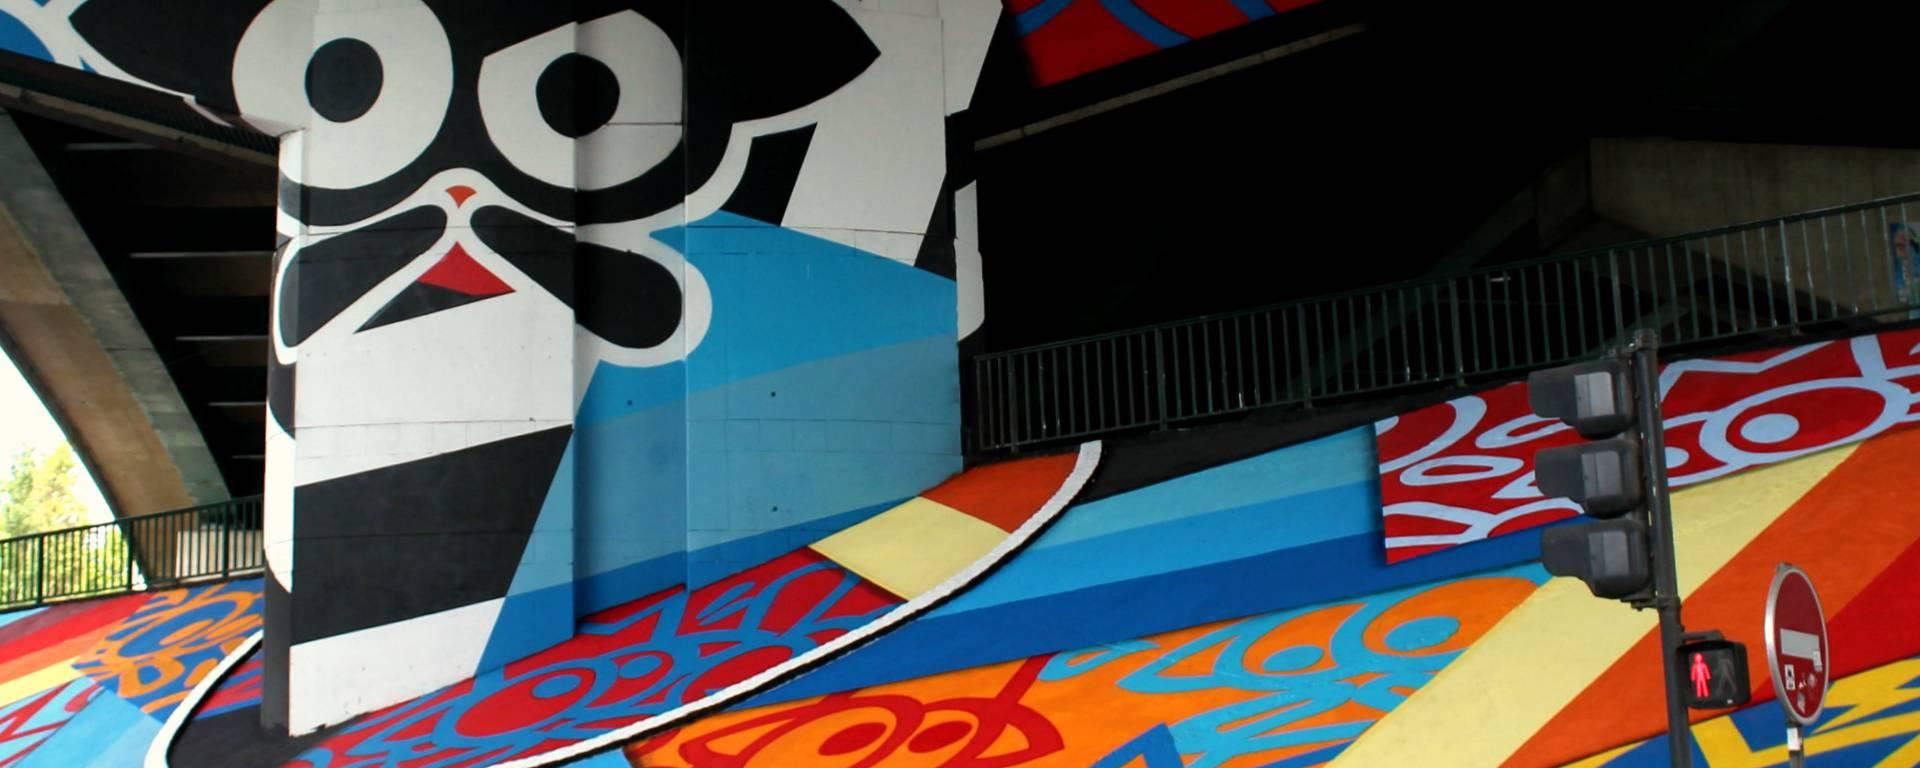 Zdey - Street Art Avenue